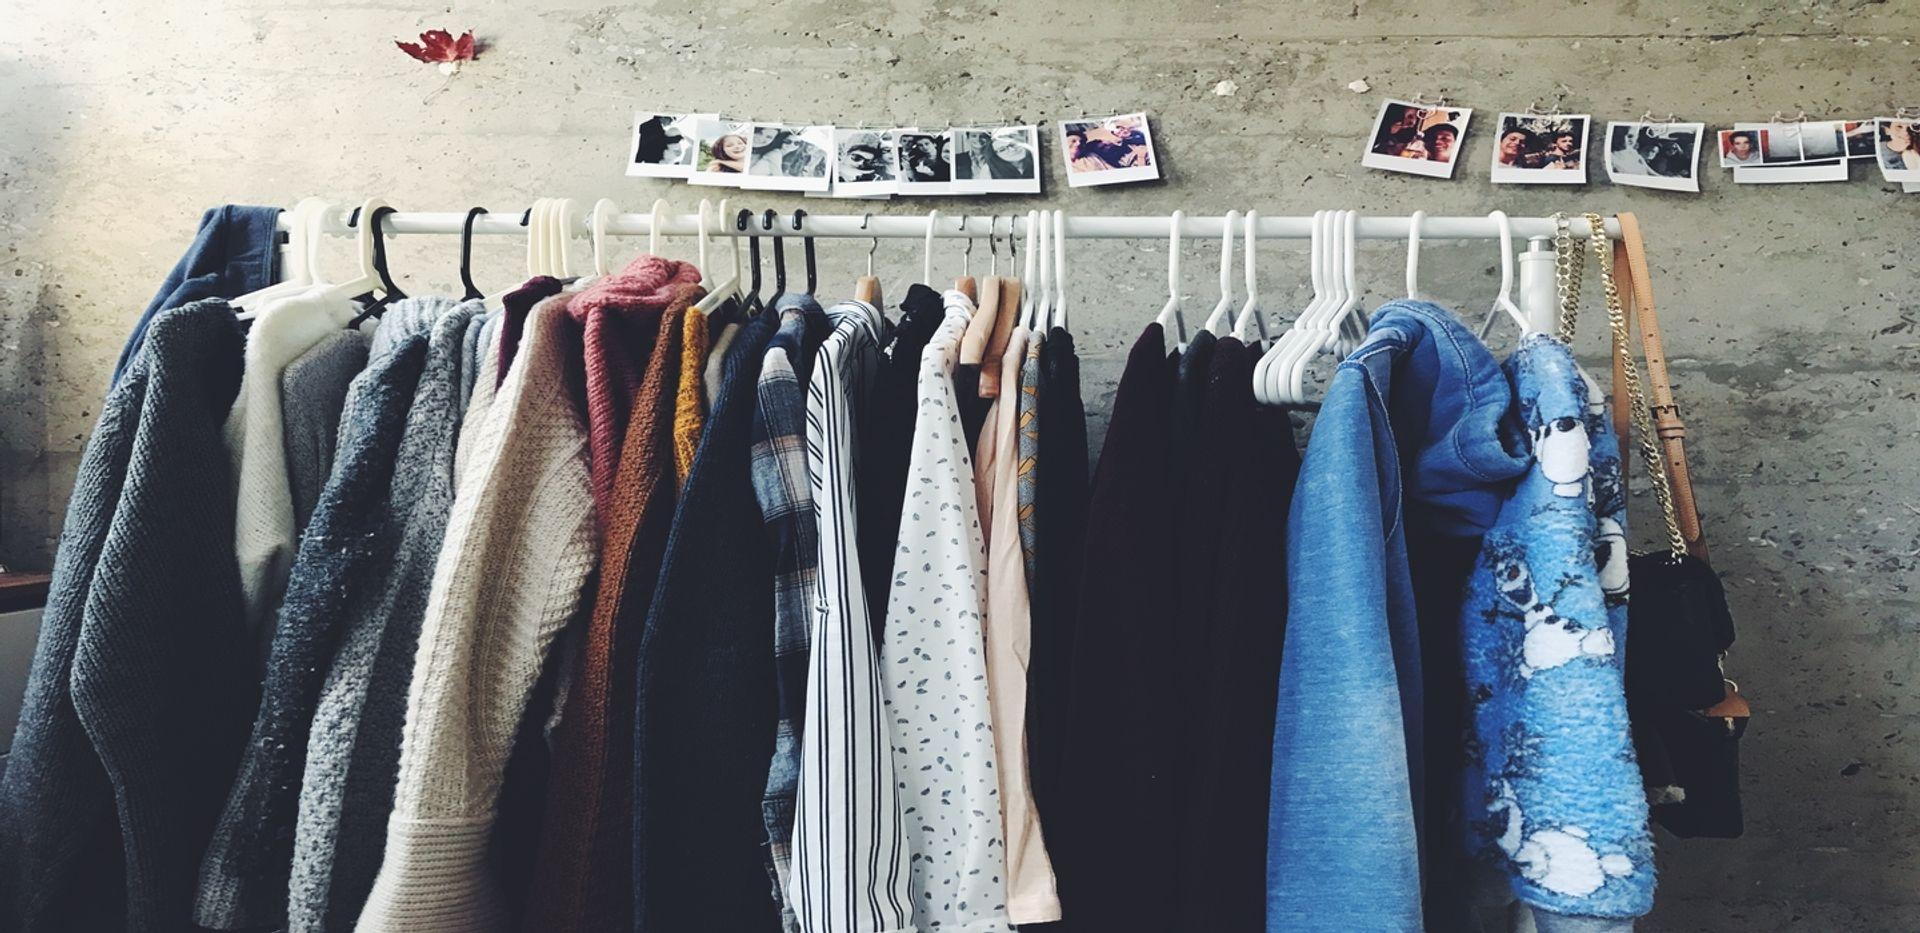 Second hand shopping/ Credit: Shanna Camilleri; Unsplash